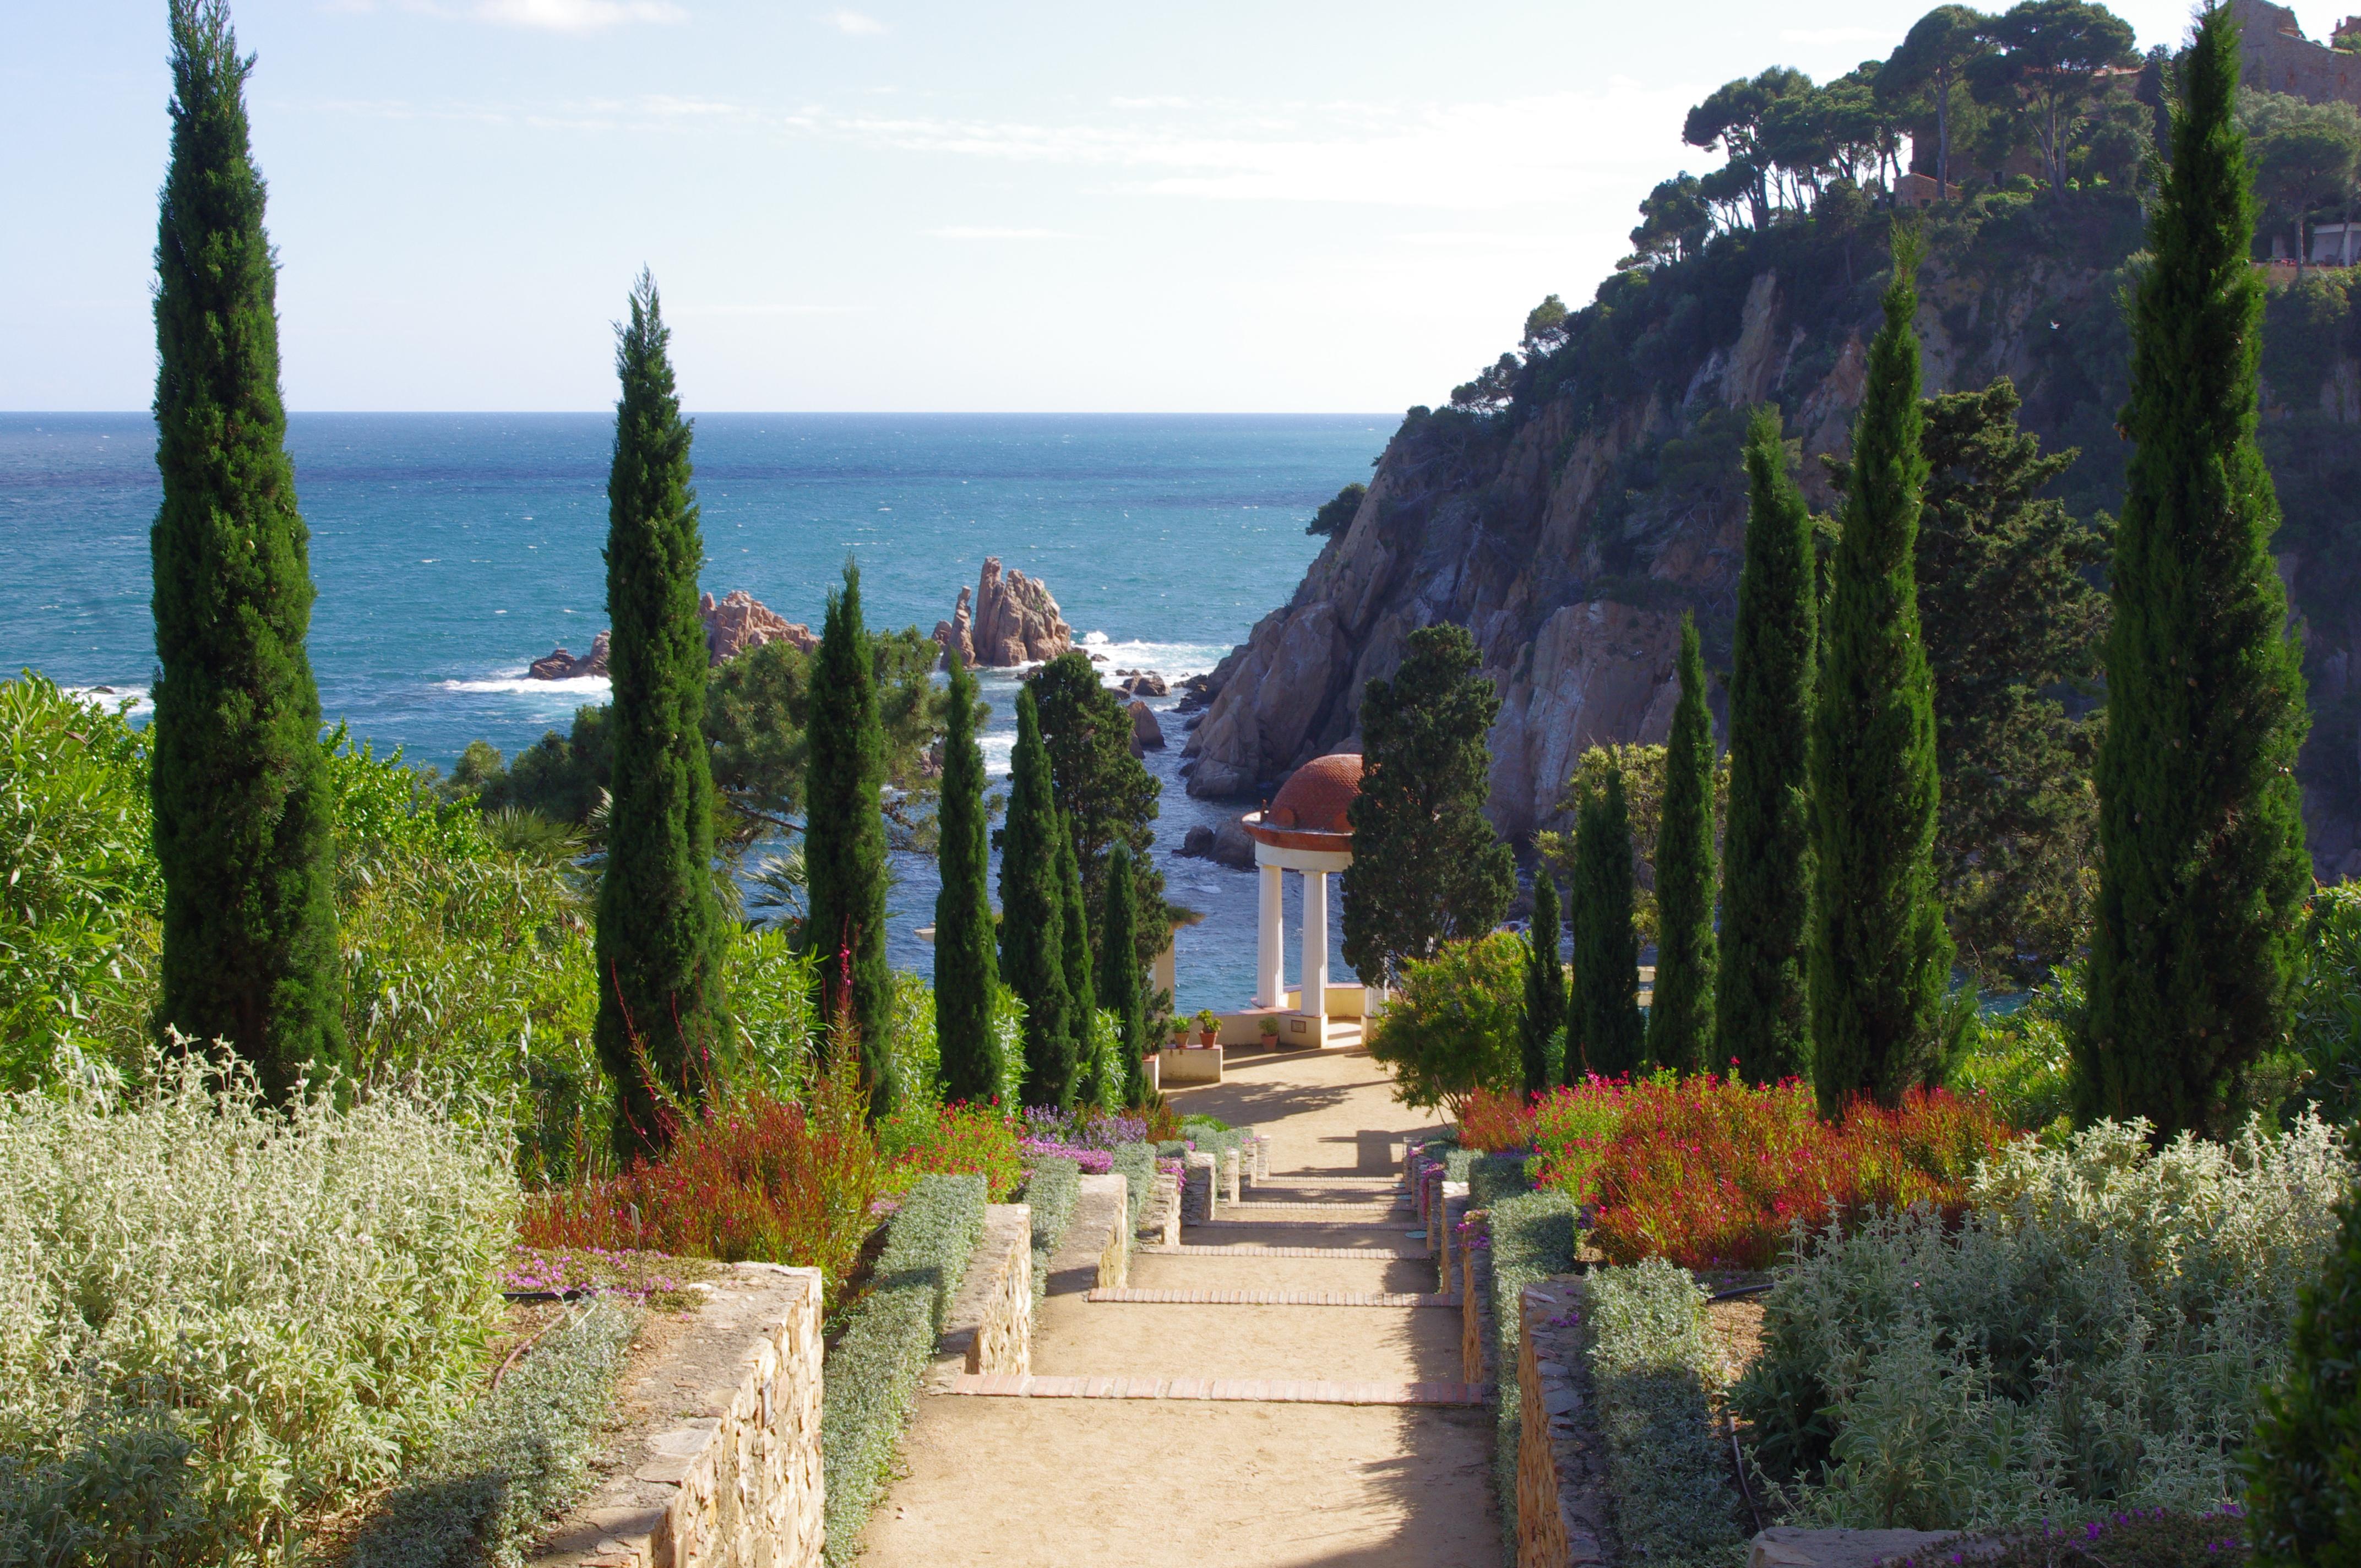 Costa brava jardins botaniques marimurtra botanical gardens - A One Day Trip Near Barcelona Marimurtra Botanical Garden